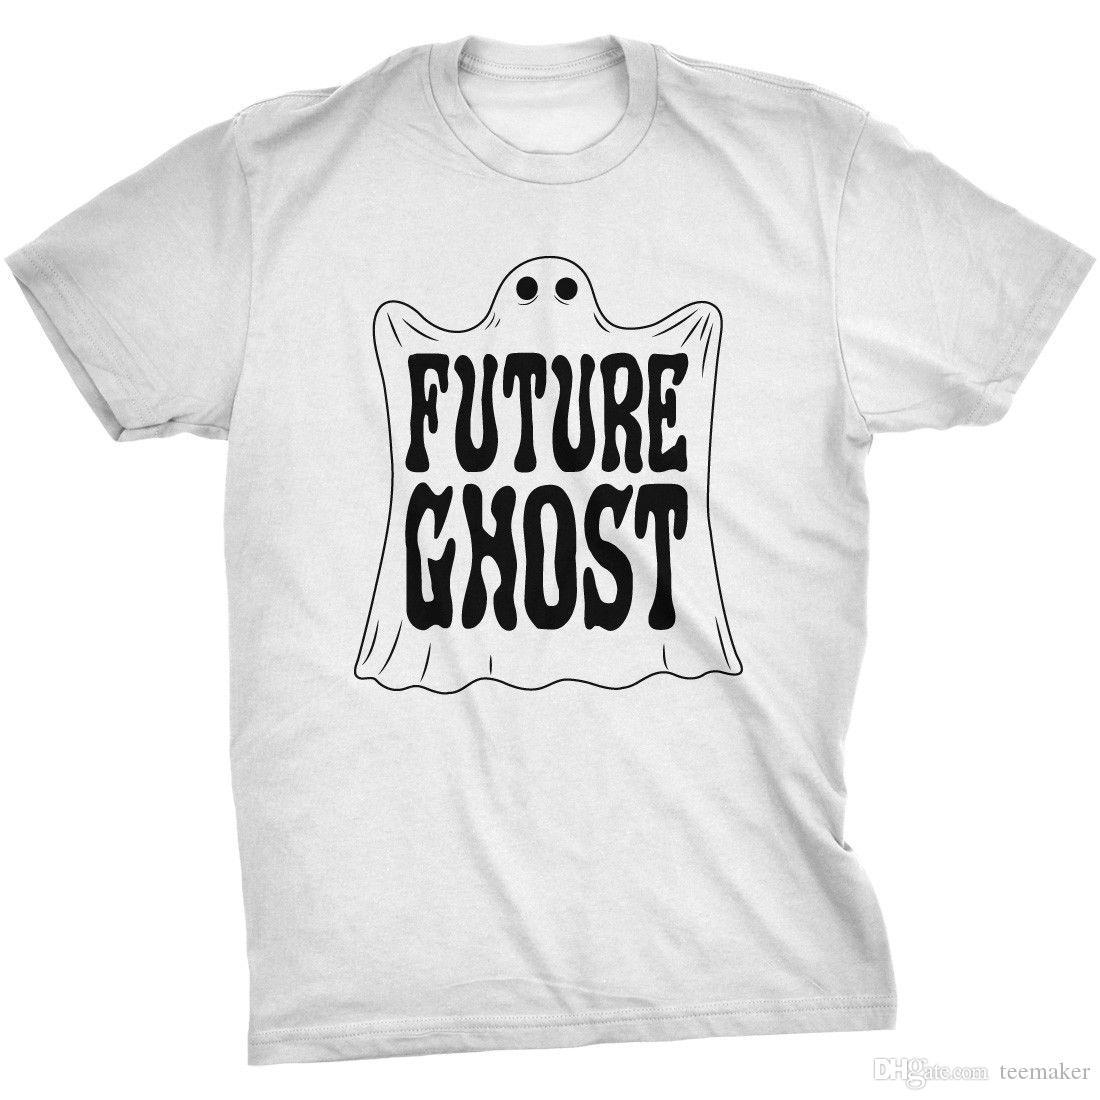 04ff1e702b7 Mens Future Ghost Funny Halloween Costume Tee Spooky Novelty T Shirt T Shirt  Men Man S Rock Custom Short Sleeve Valentine S Big Size Party T Designer  White ...